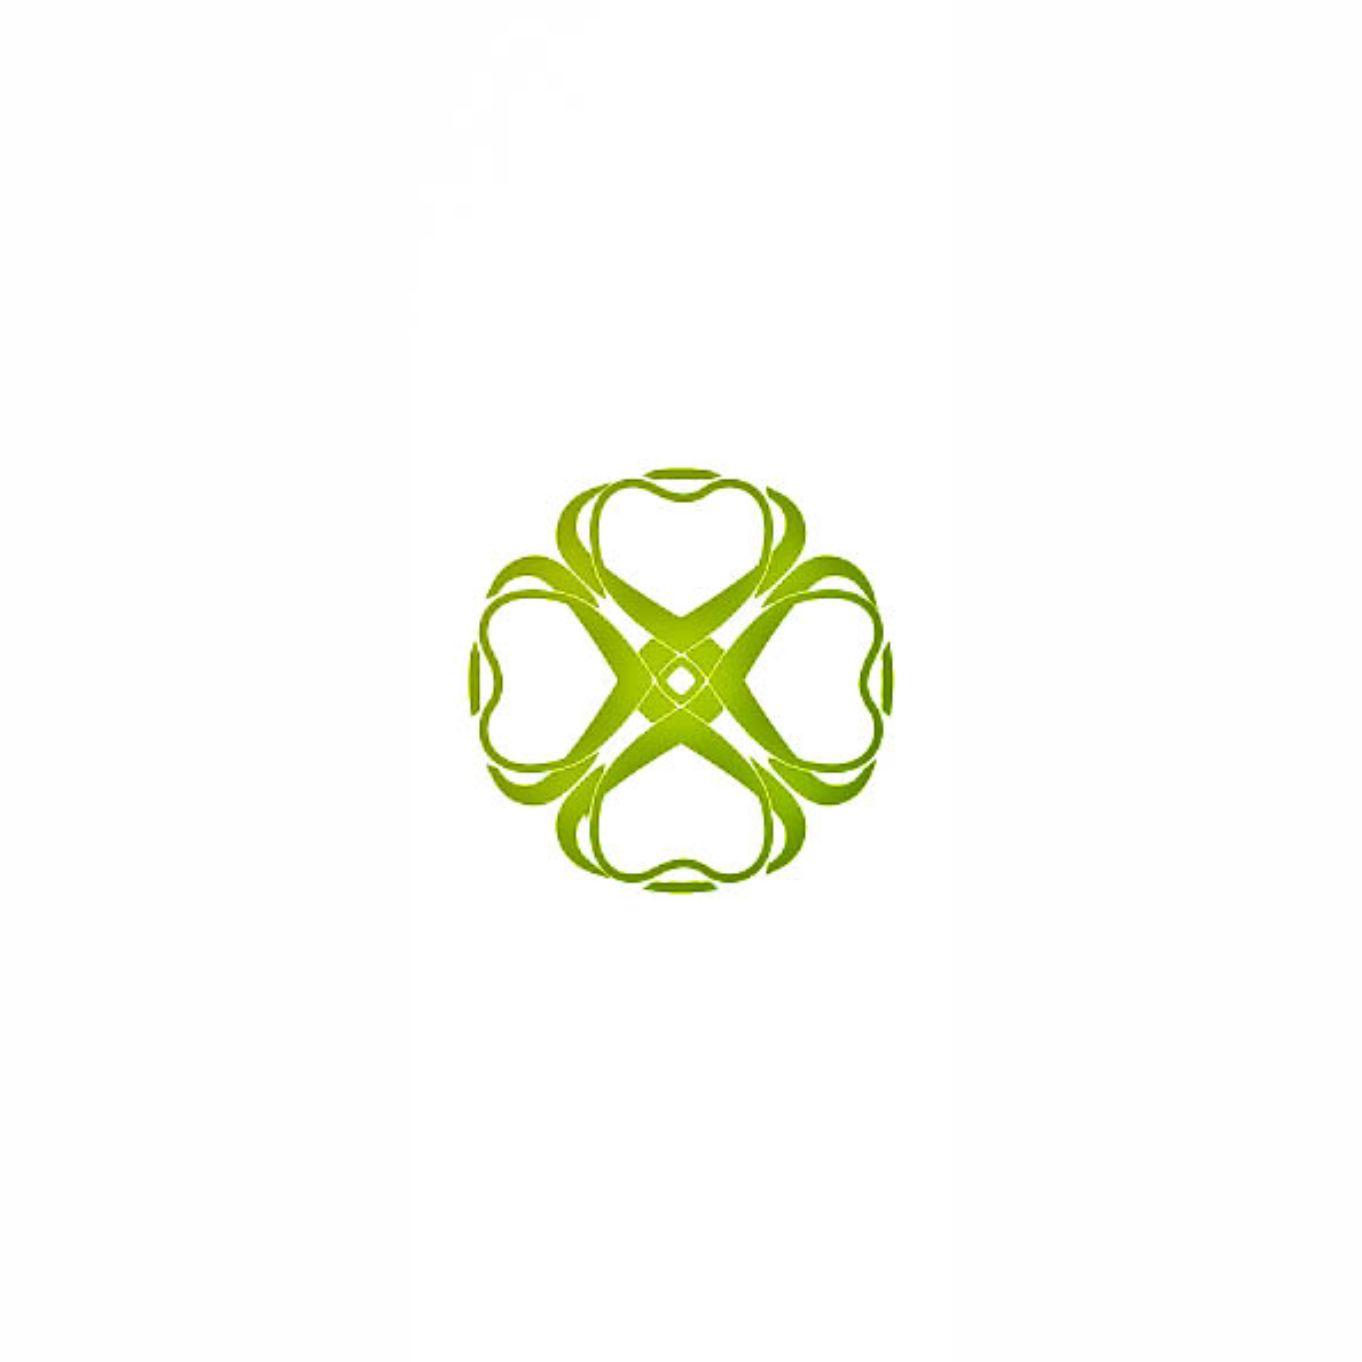 Разработка логотипа  TRIUMPH MEDIA с изображением клевера фото f_507133c2da22d.jpg